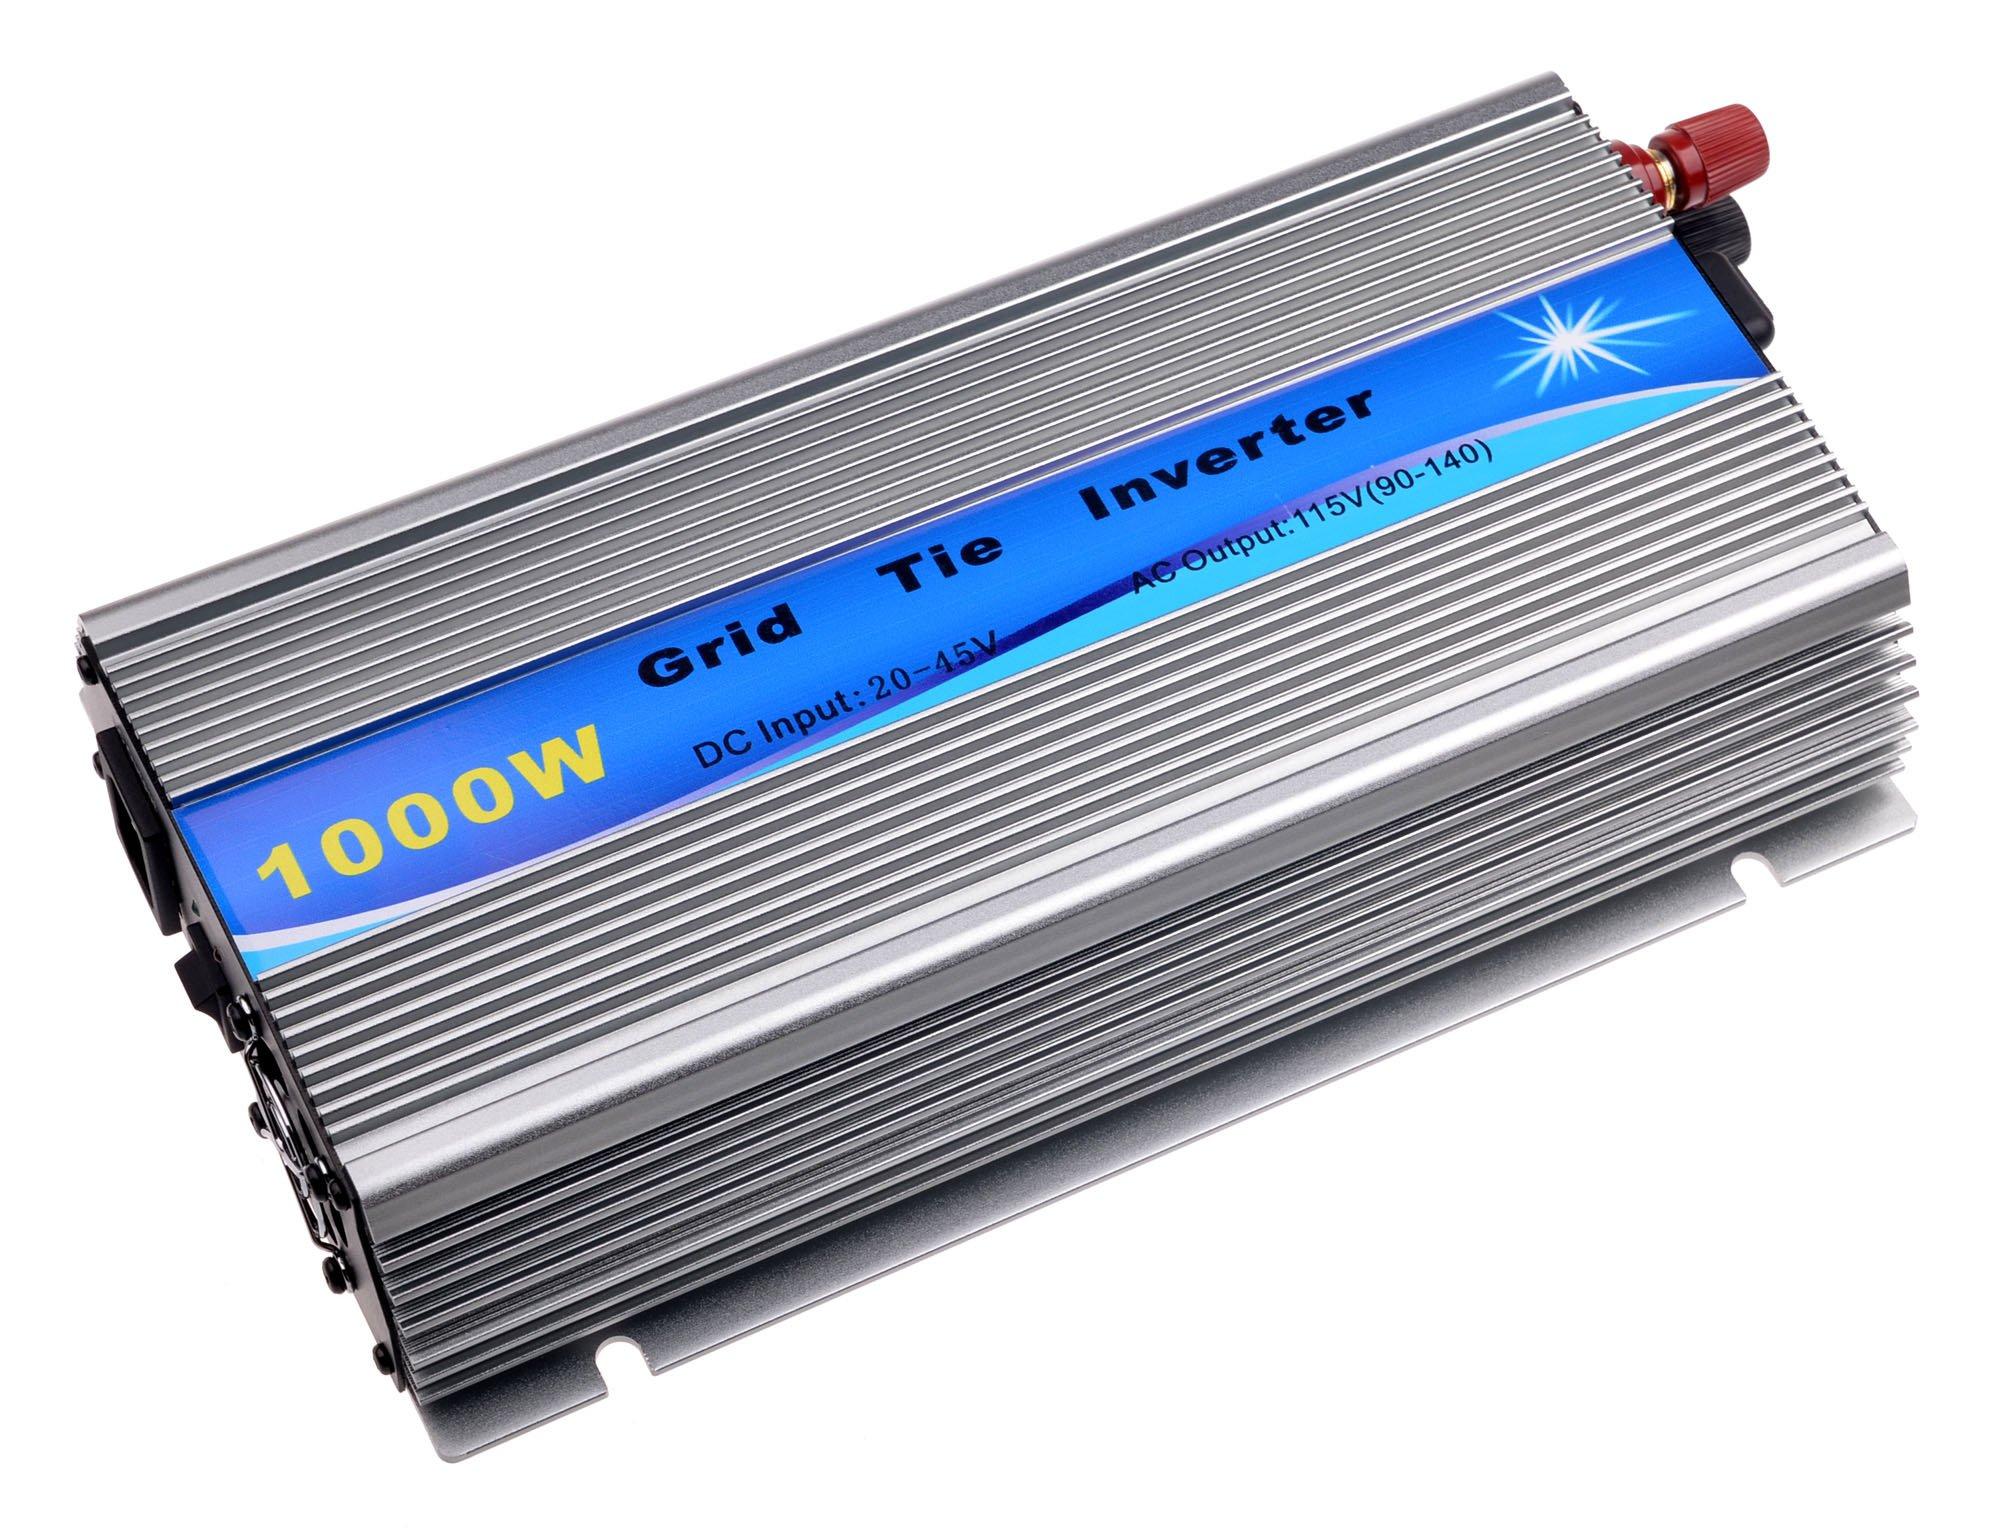 SolarEpic Grid Tie Inverter 1000w Stackable w/MPPT 20-45v Input 110v Output by SolarEpic